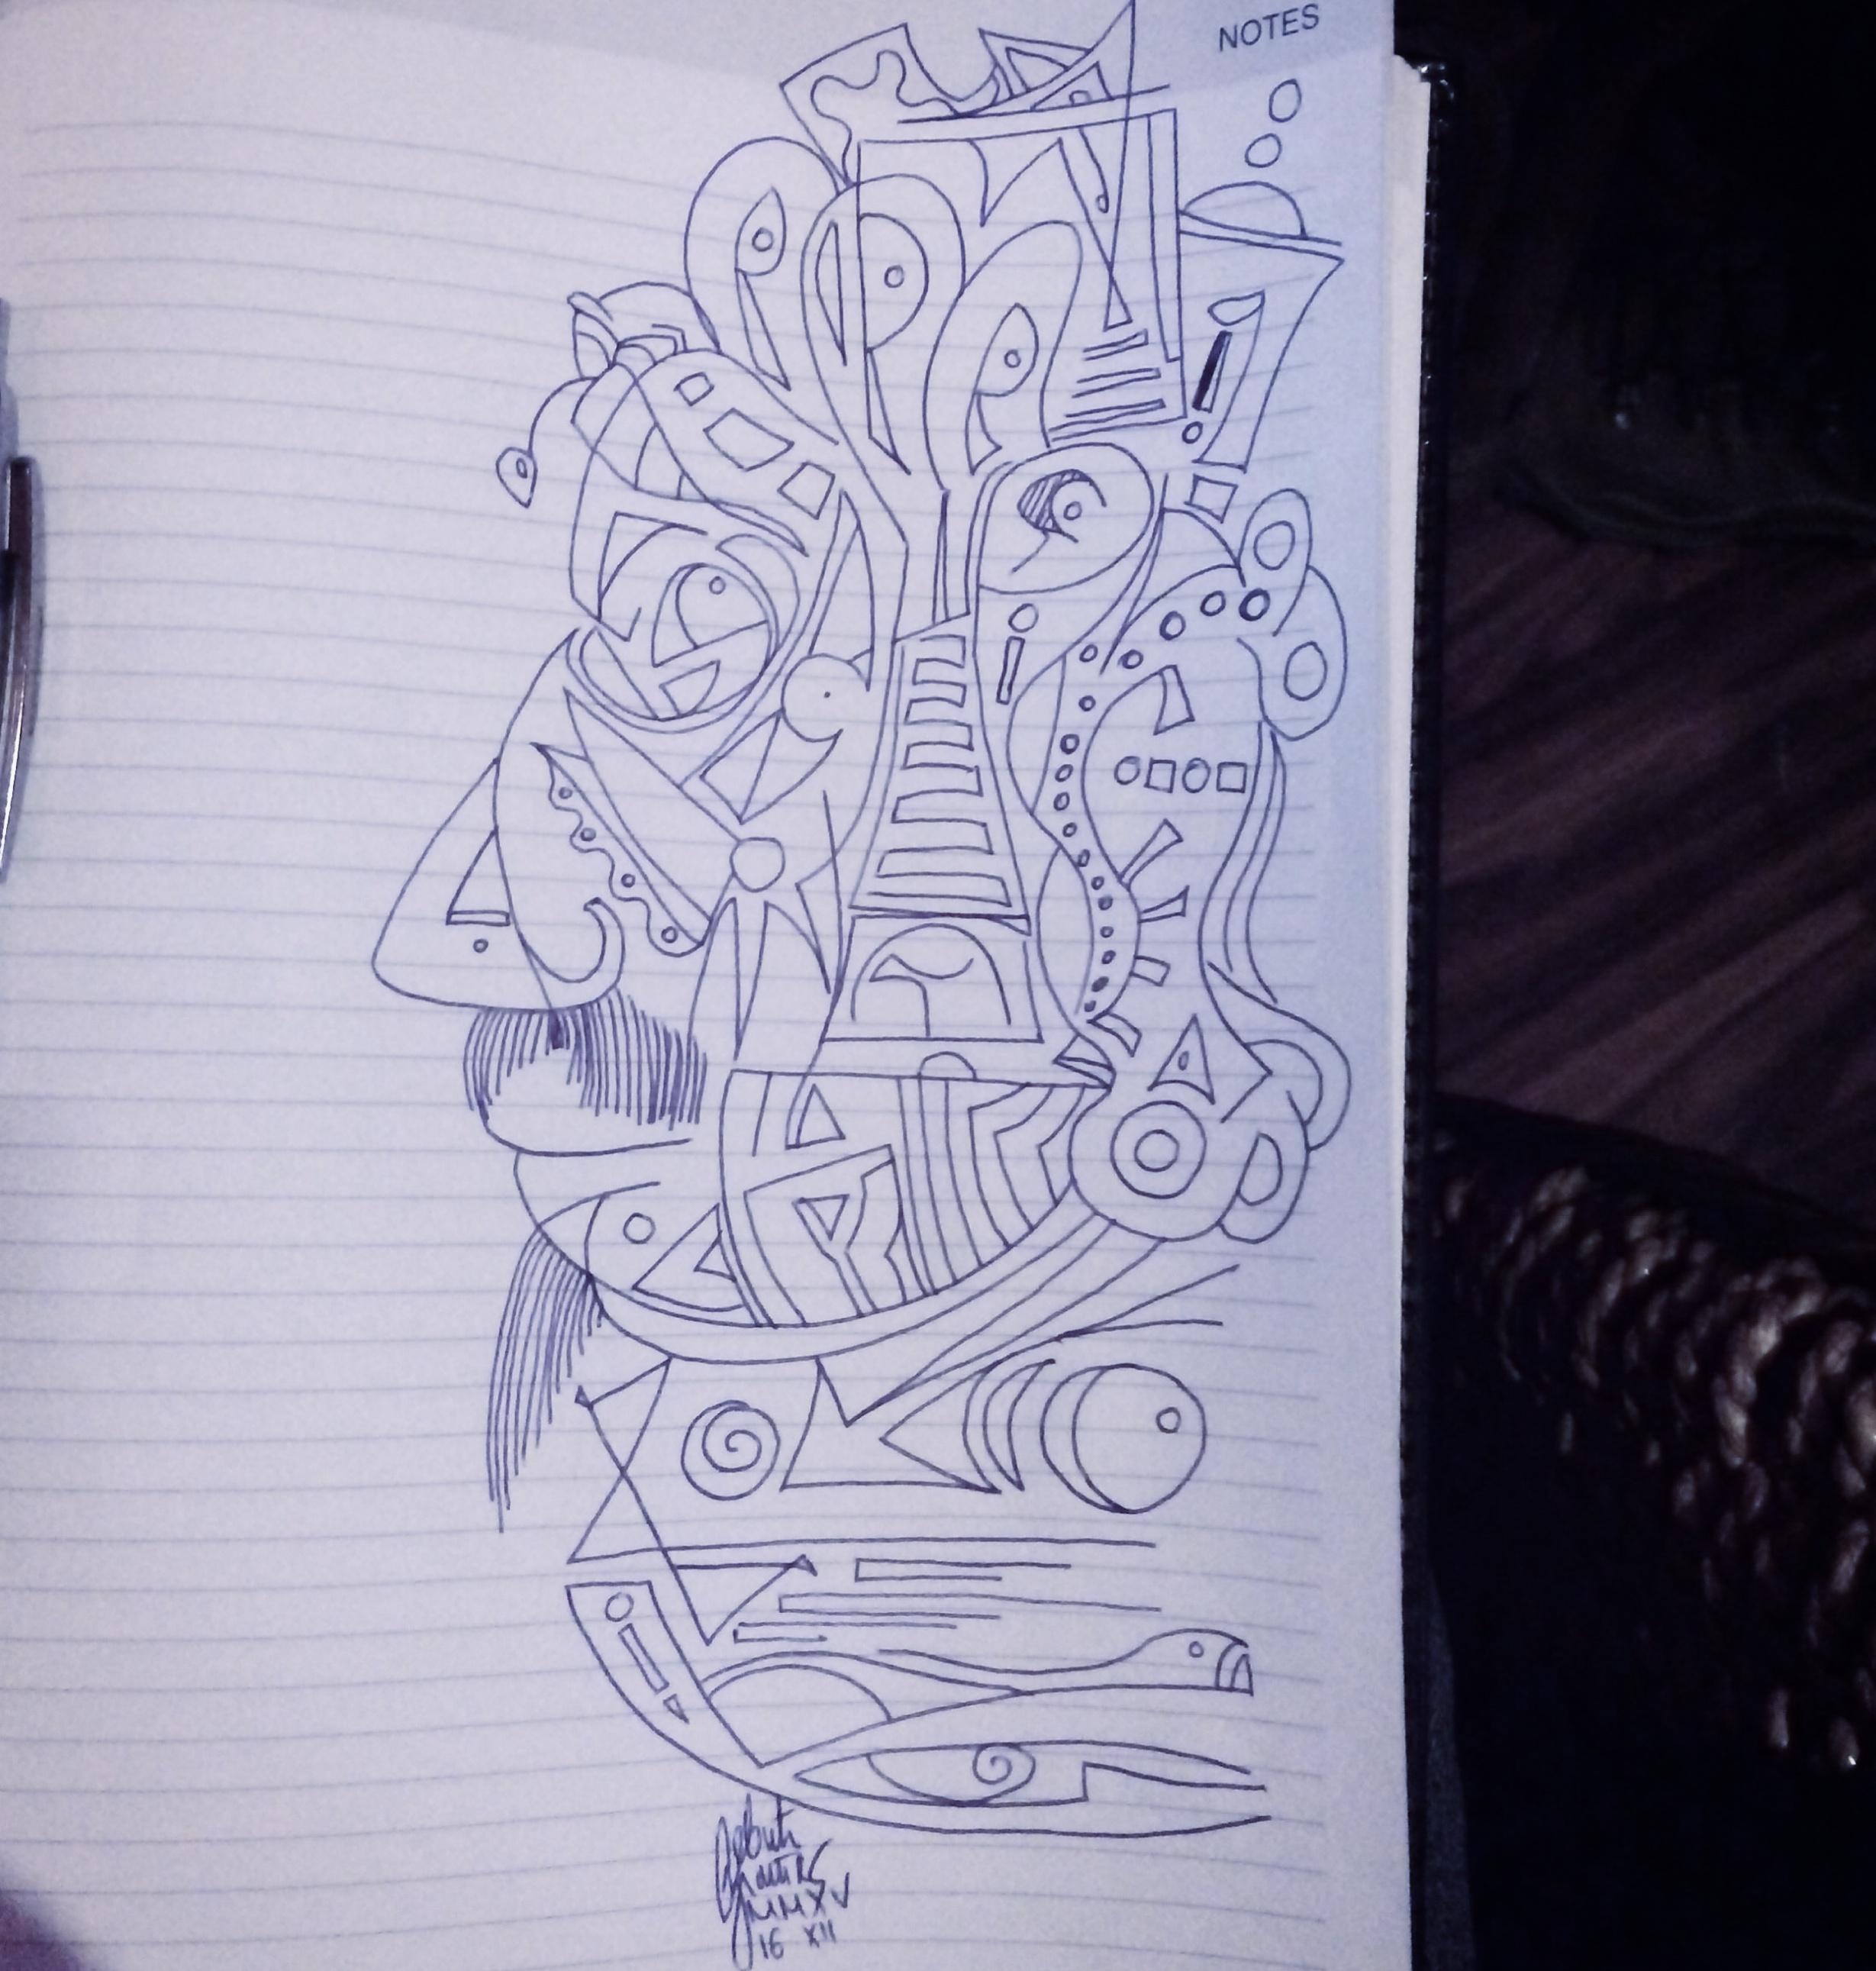 Morning doodle - 16. XII '15 - Takumar by zlajonja